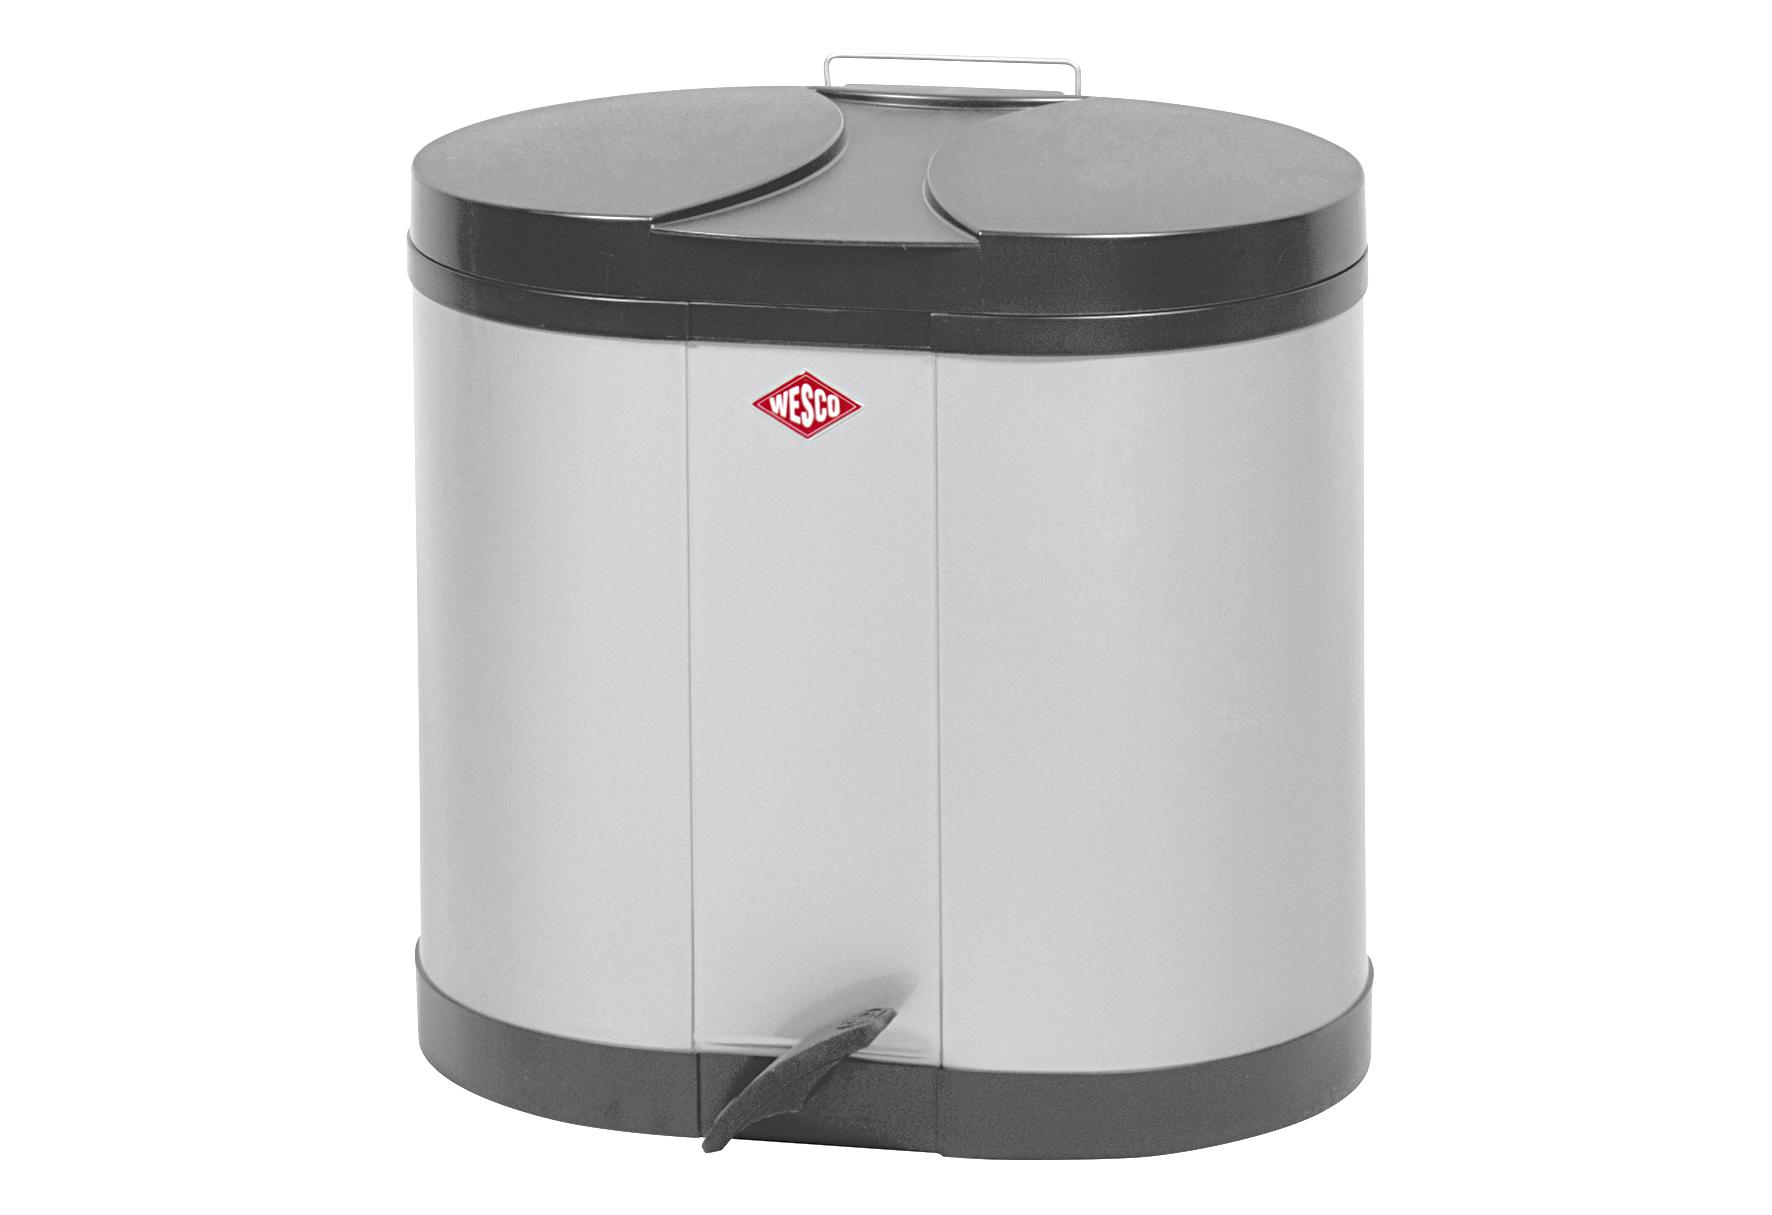 WESCO Abfallbehälter Ökosammler 2x15ltr. 43x36x45cm silber